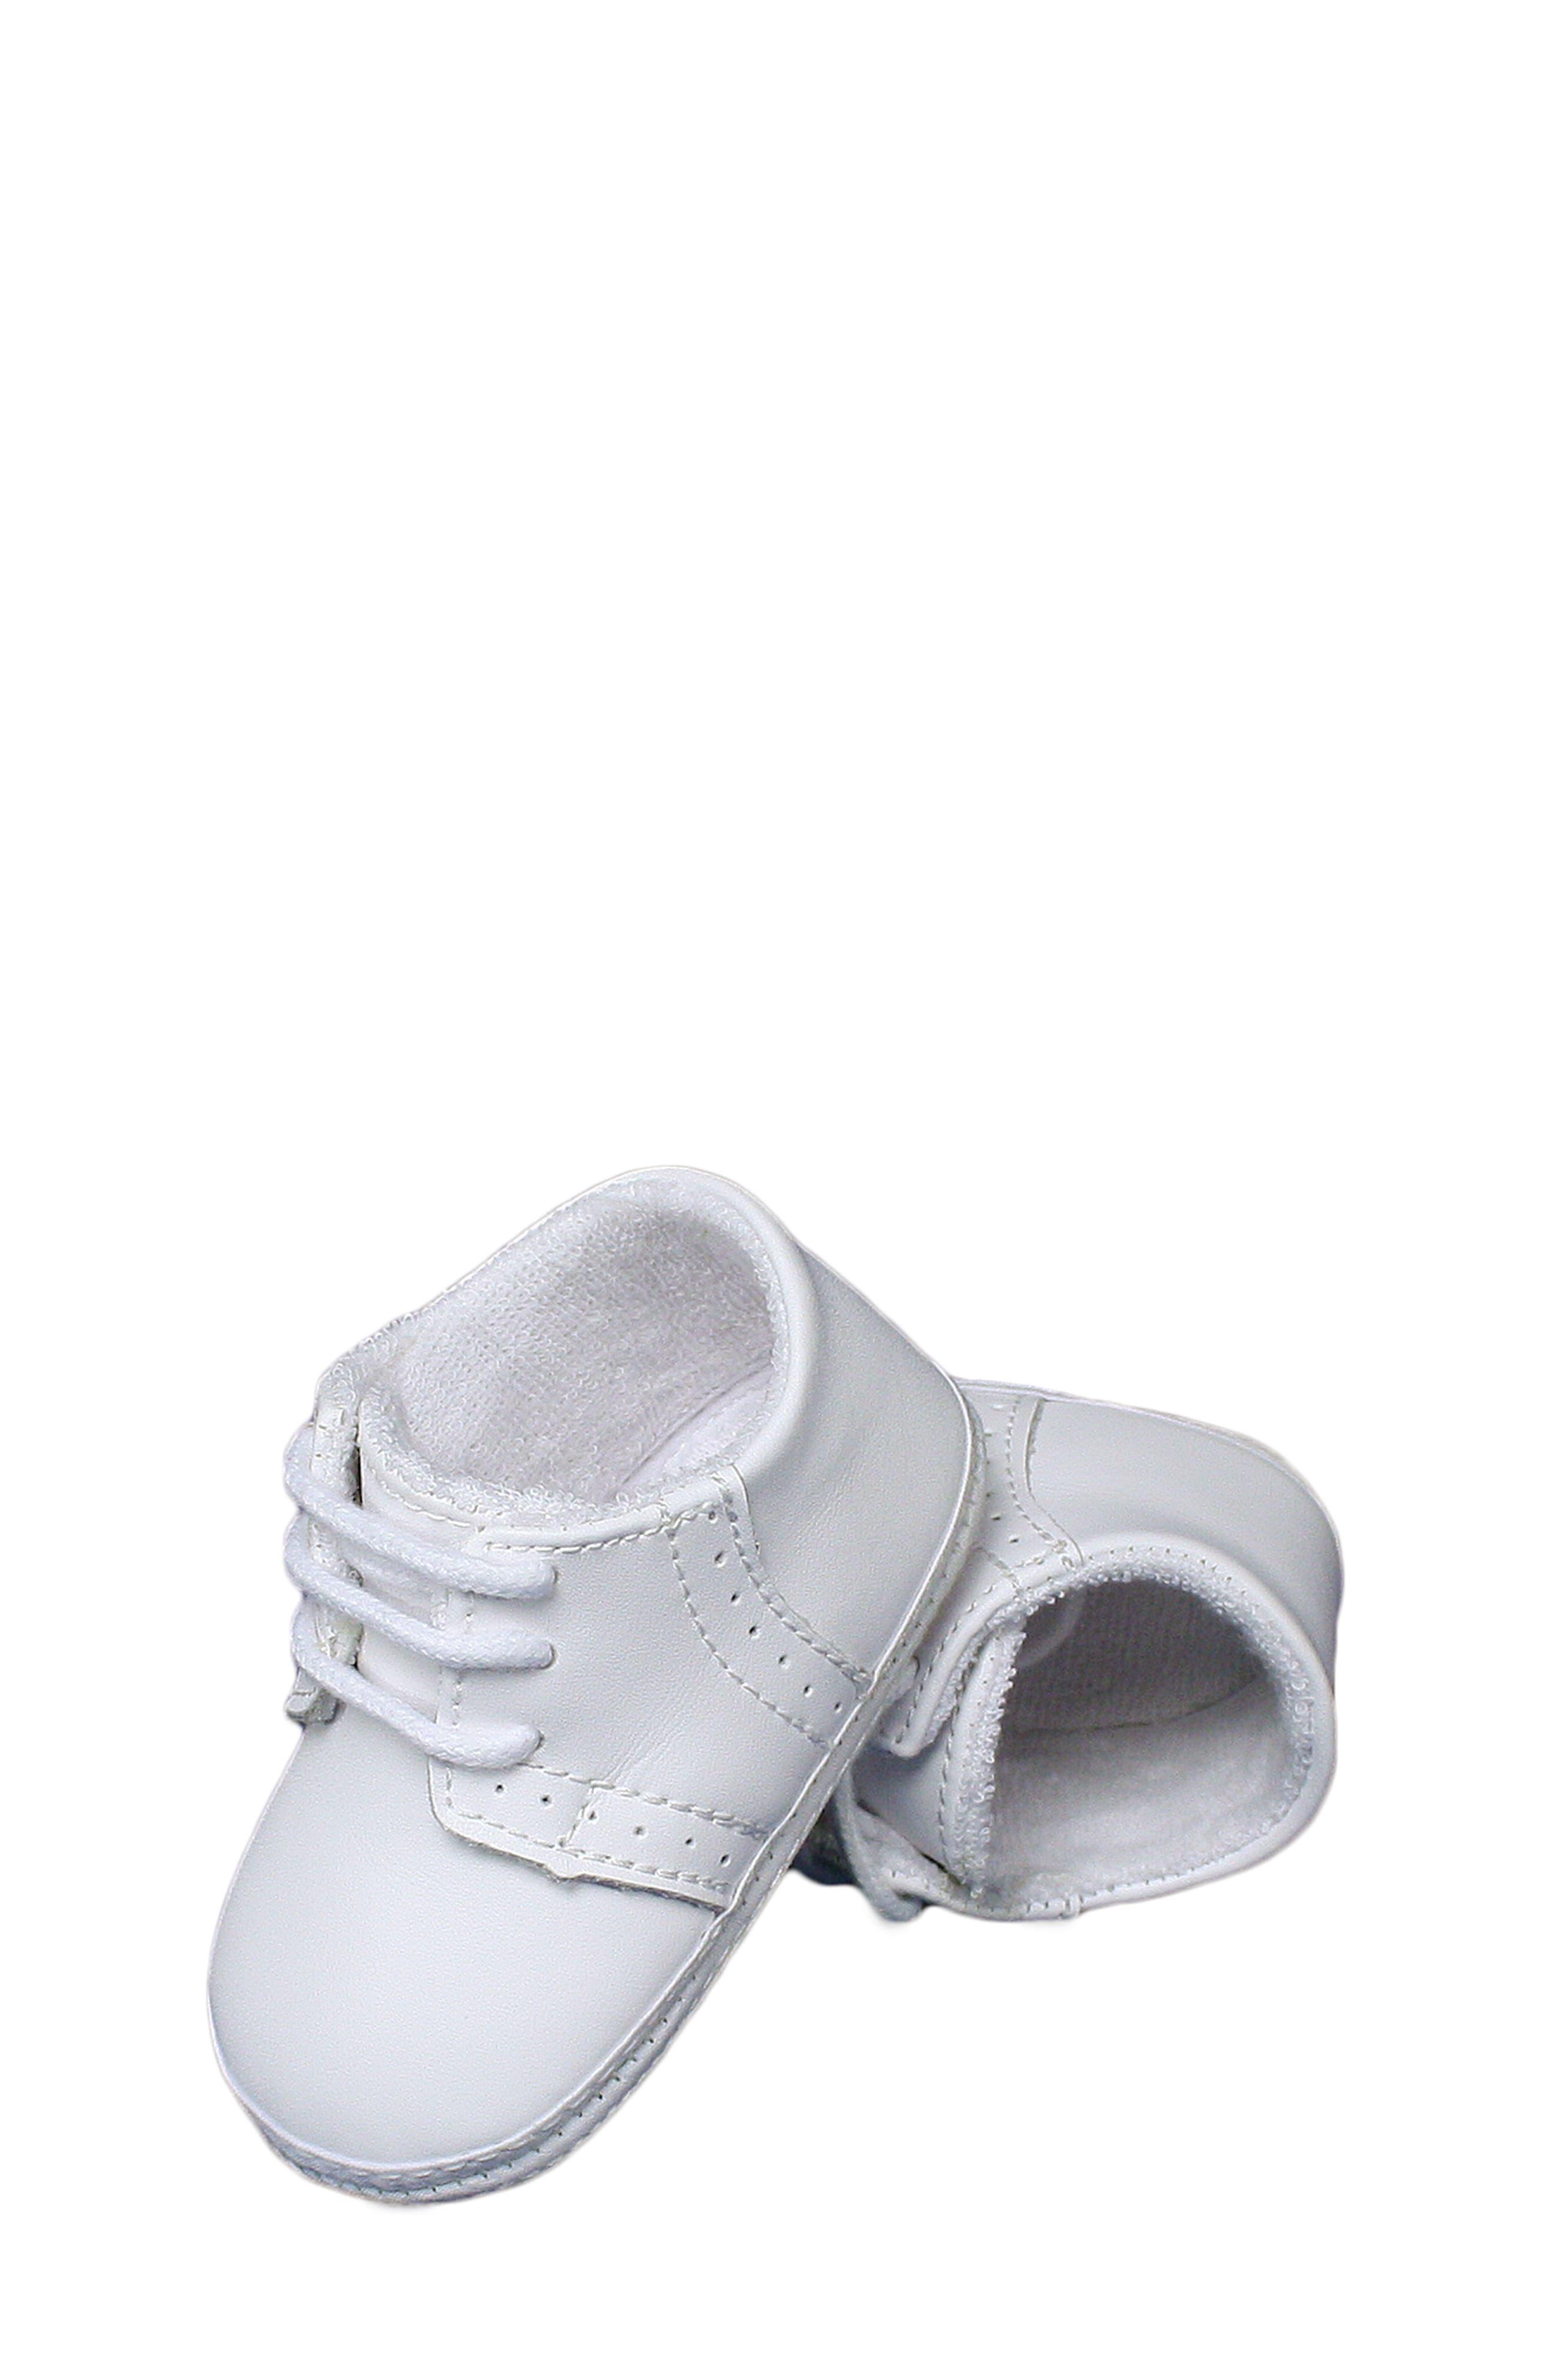 Leather Crib Shoe,                             Alternate thumbnail 2, color,                             White